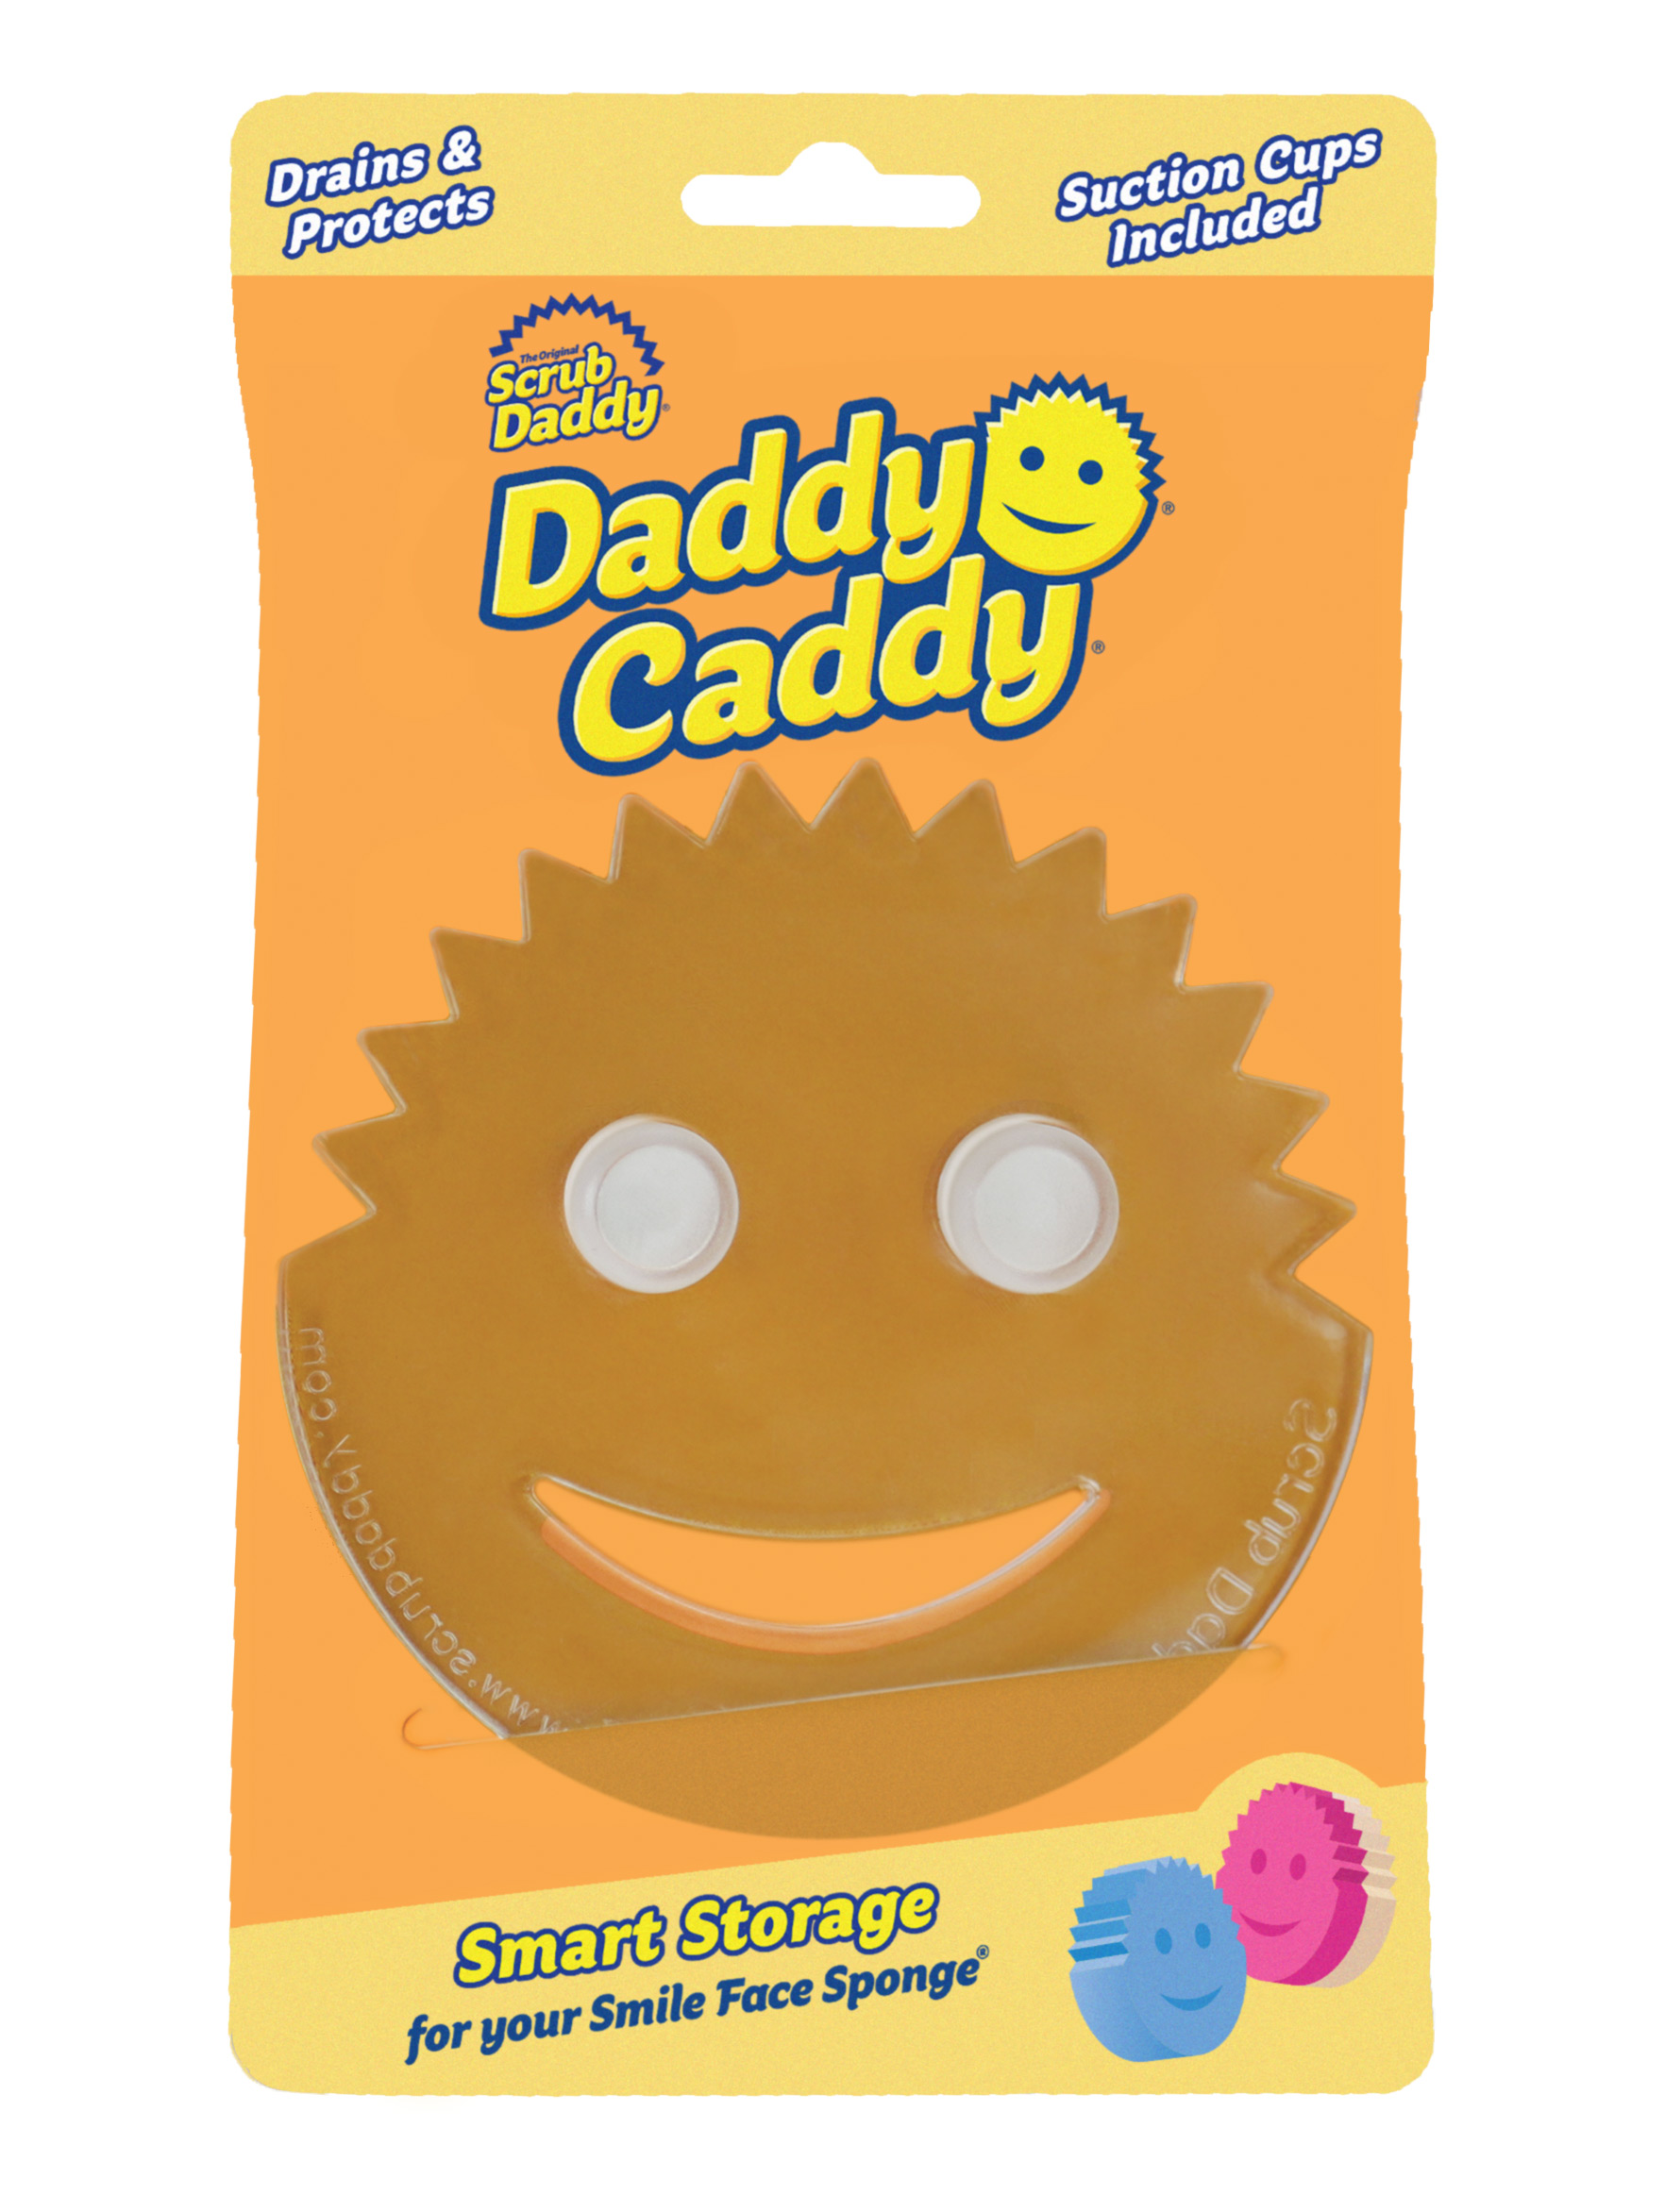 Daddy-Caddy-1ct-retail-pkg